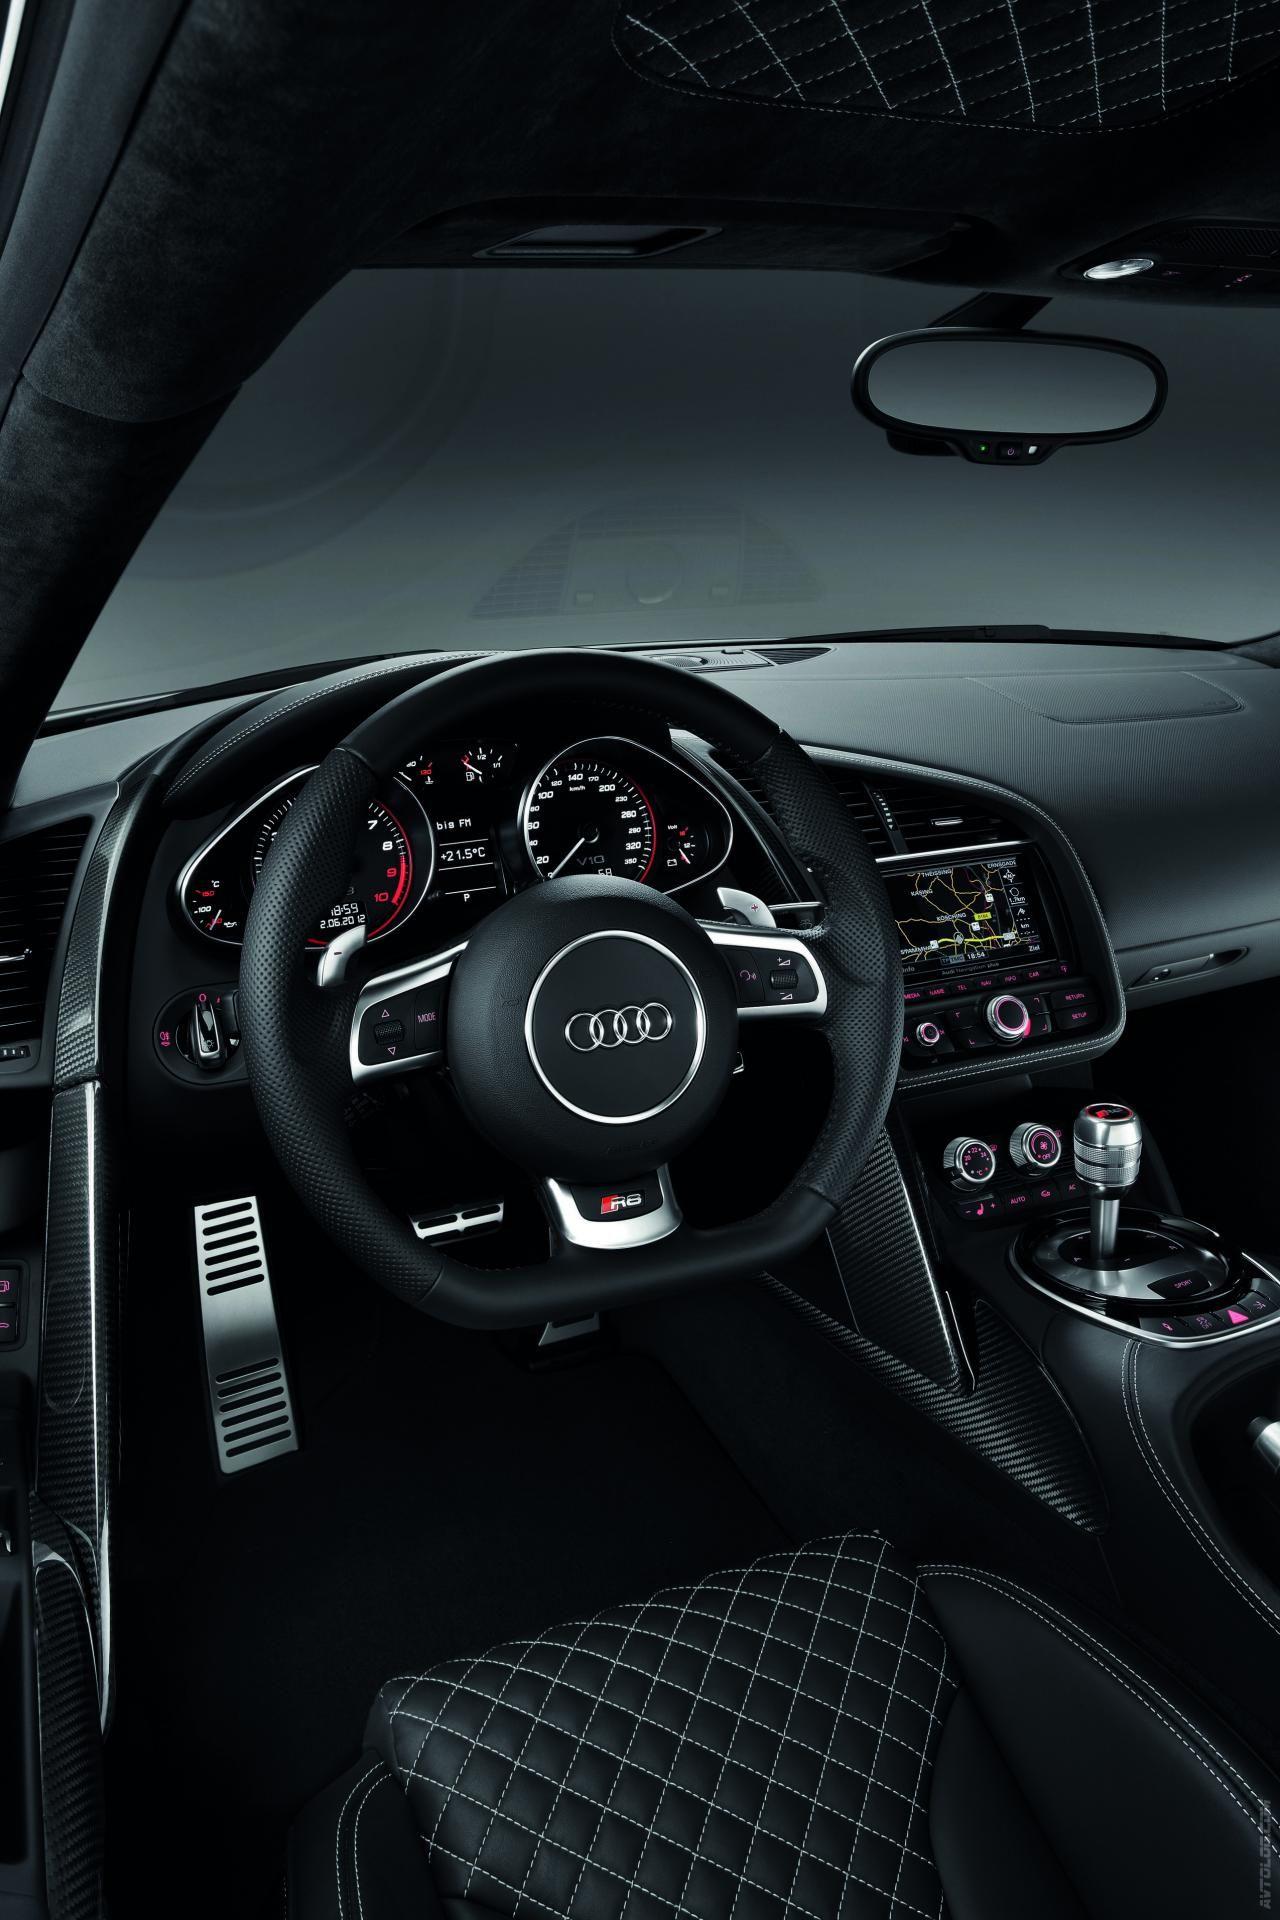 2013 Audi R8 V10 Cool Sports Cars Audi R8 Interior Audi R8